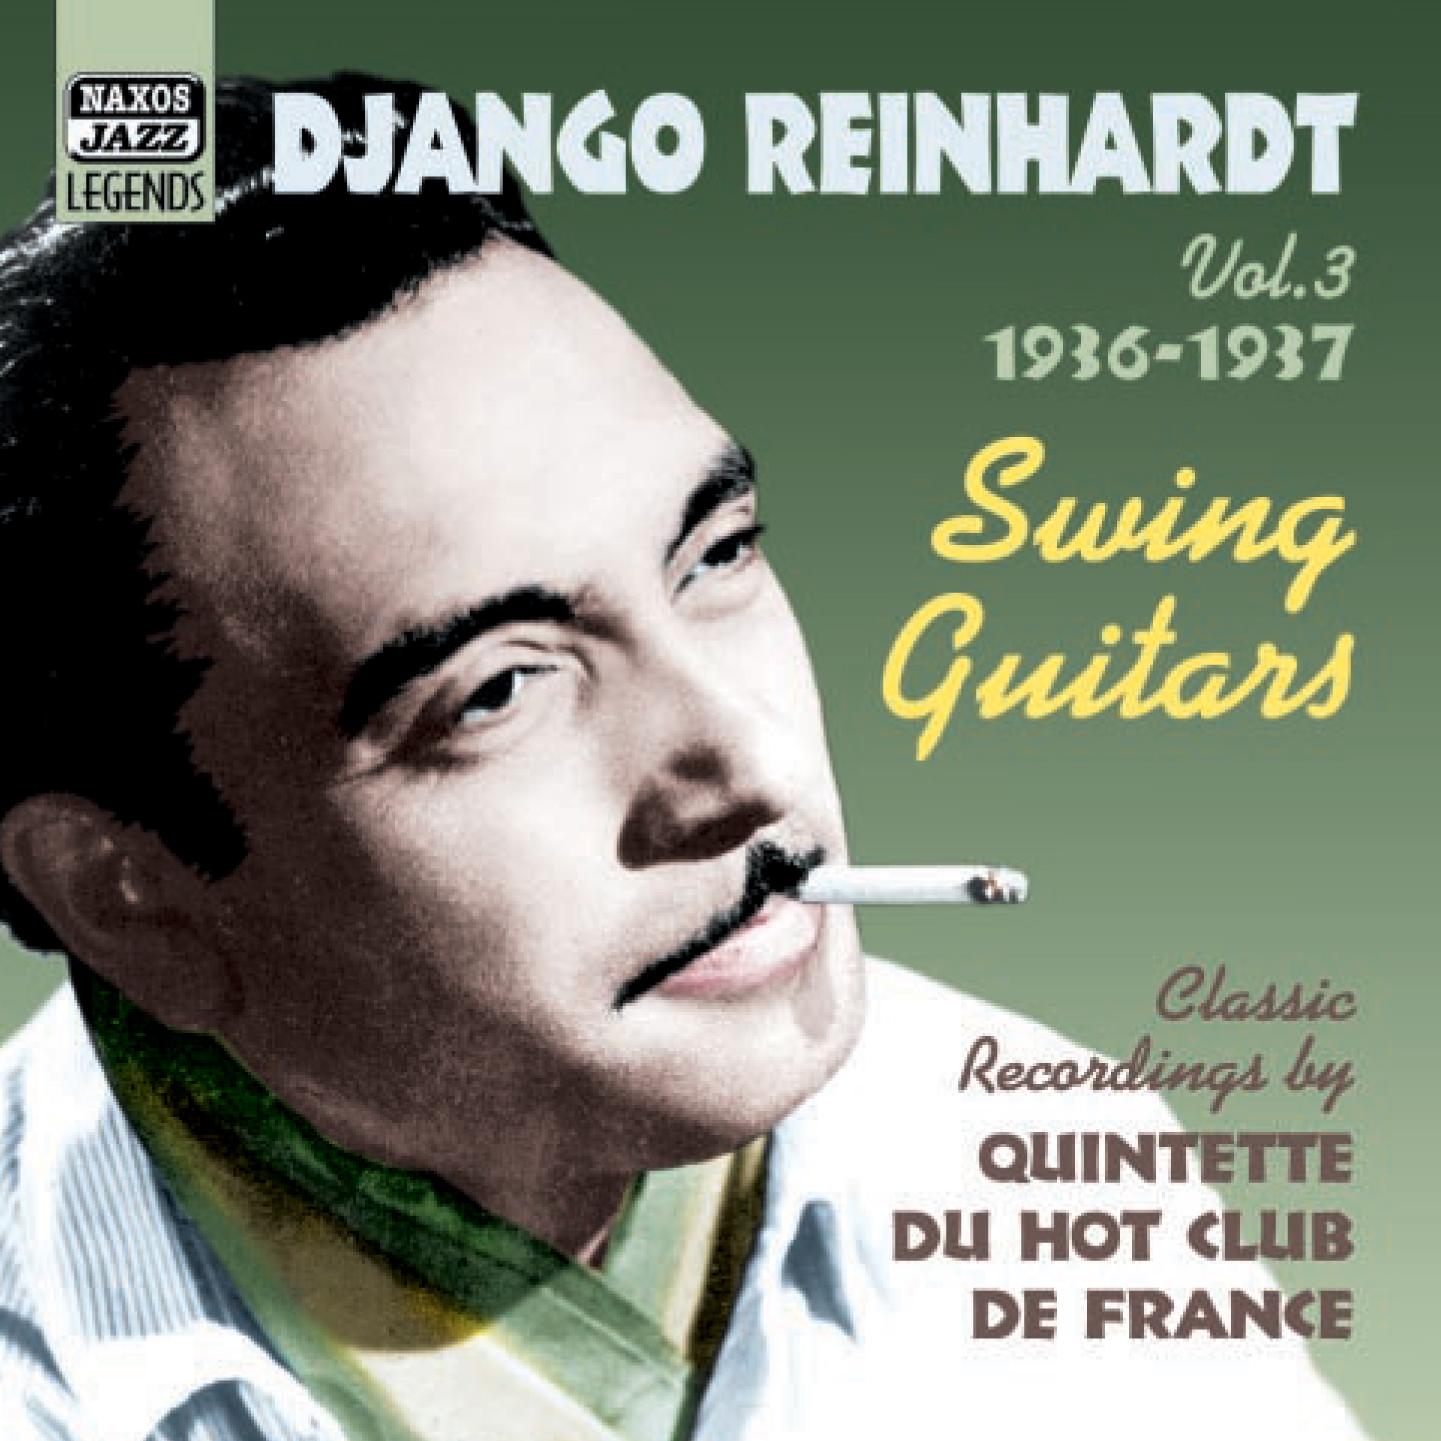 Django Reinhardt - Swing Guitars Vol 3.